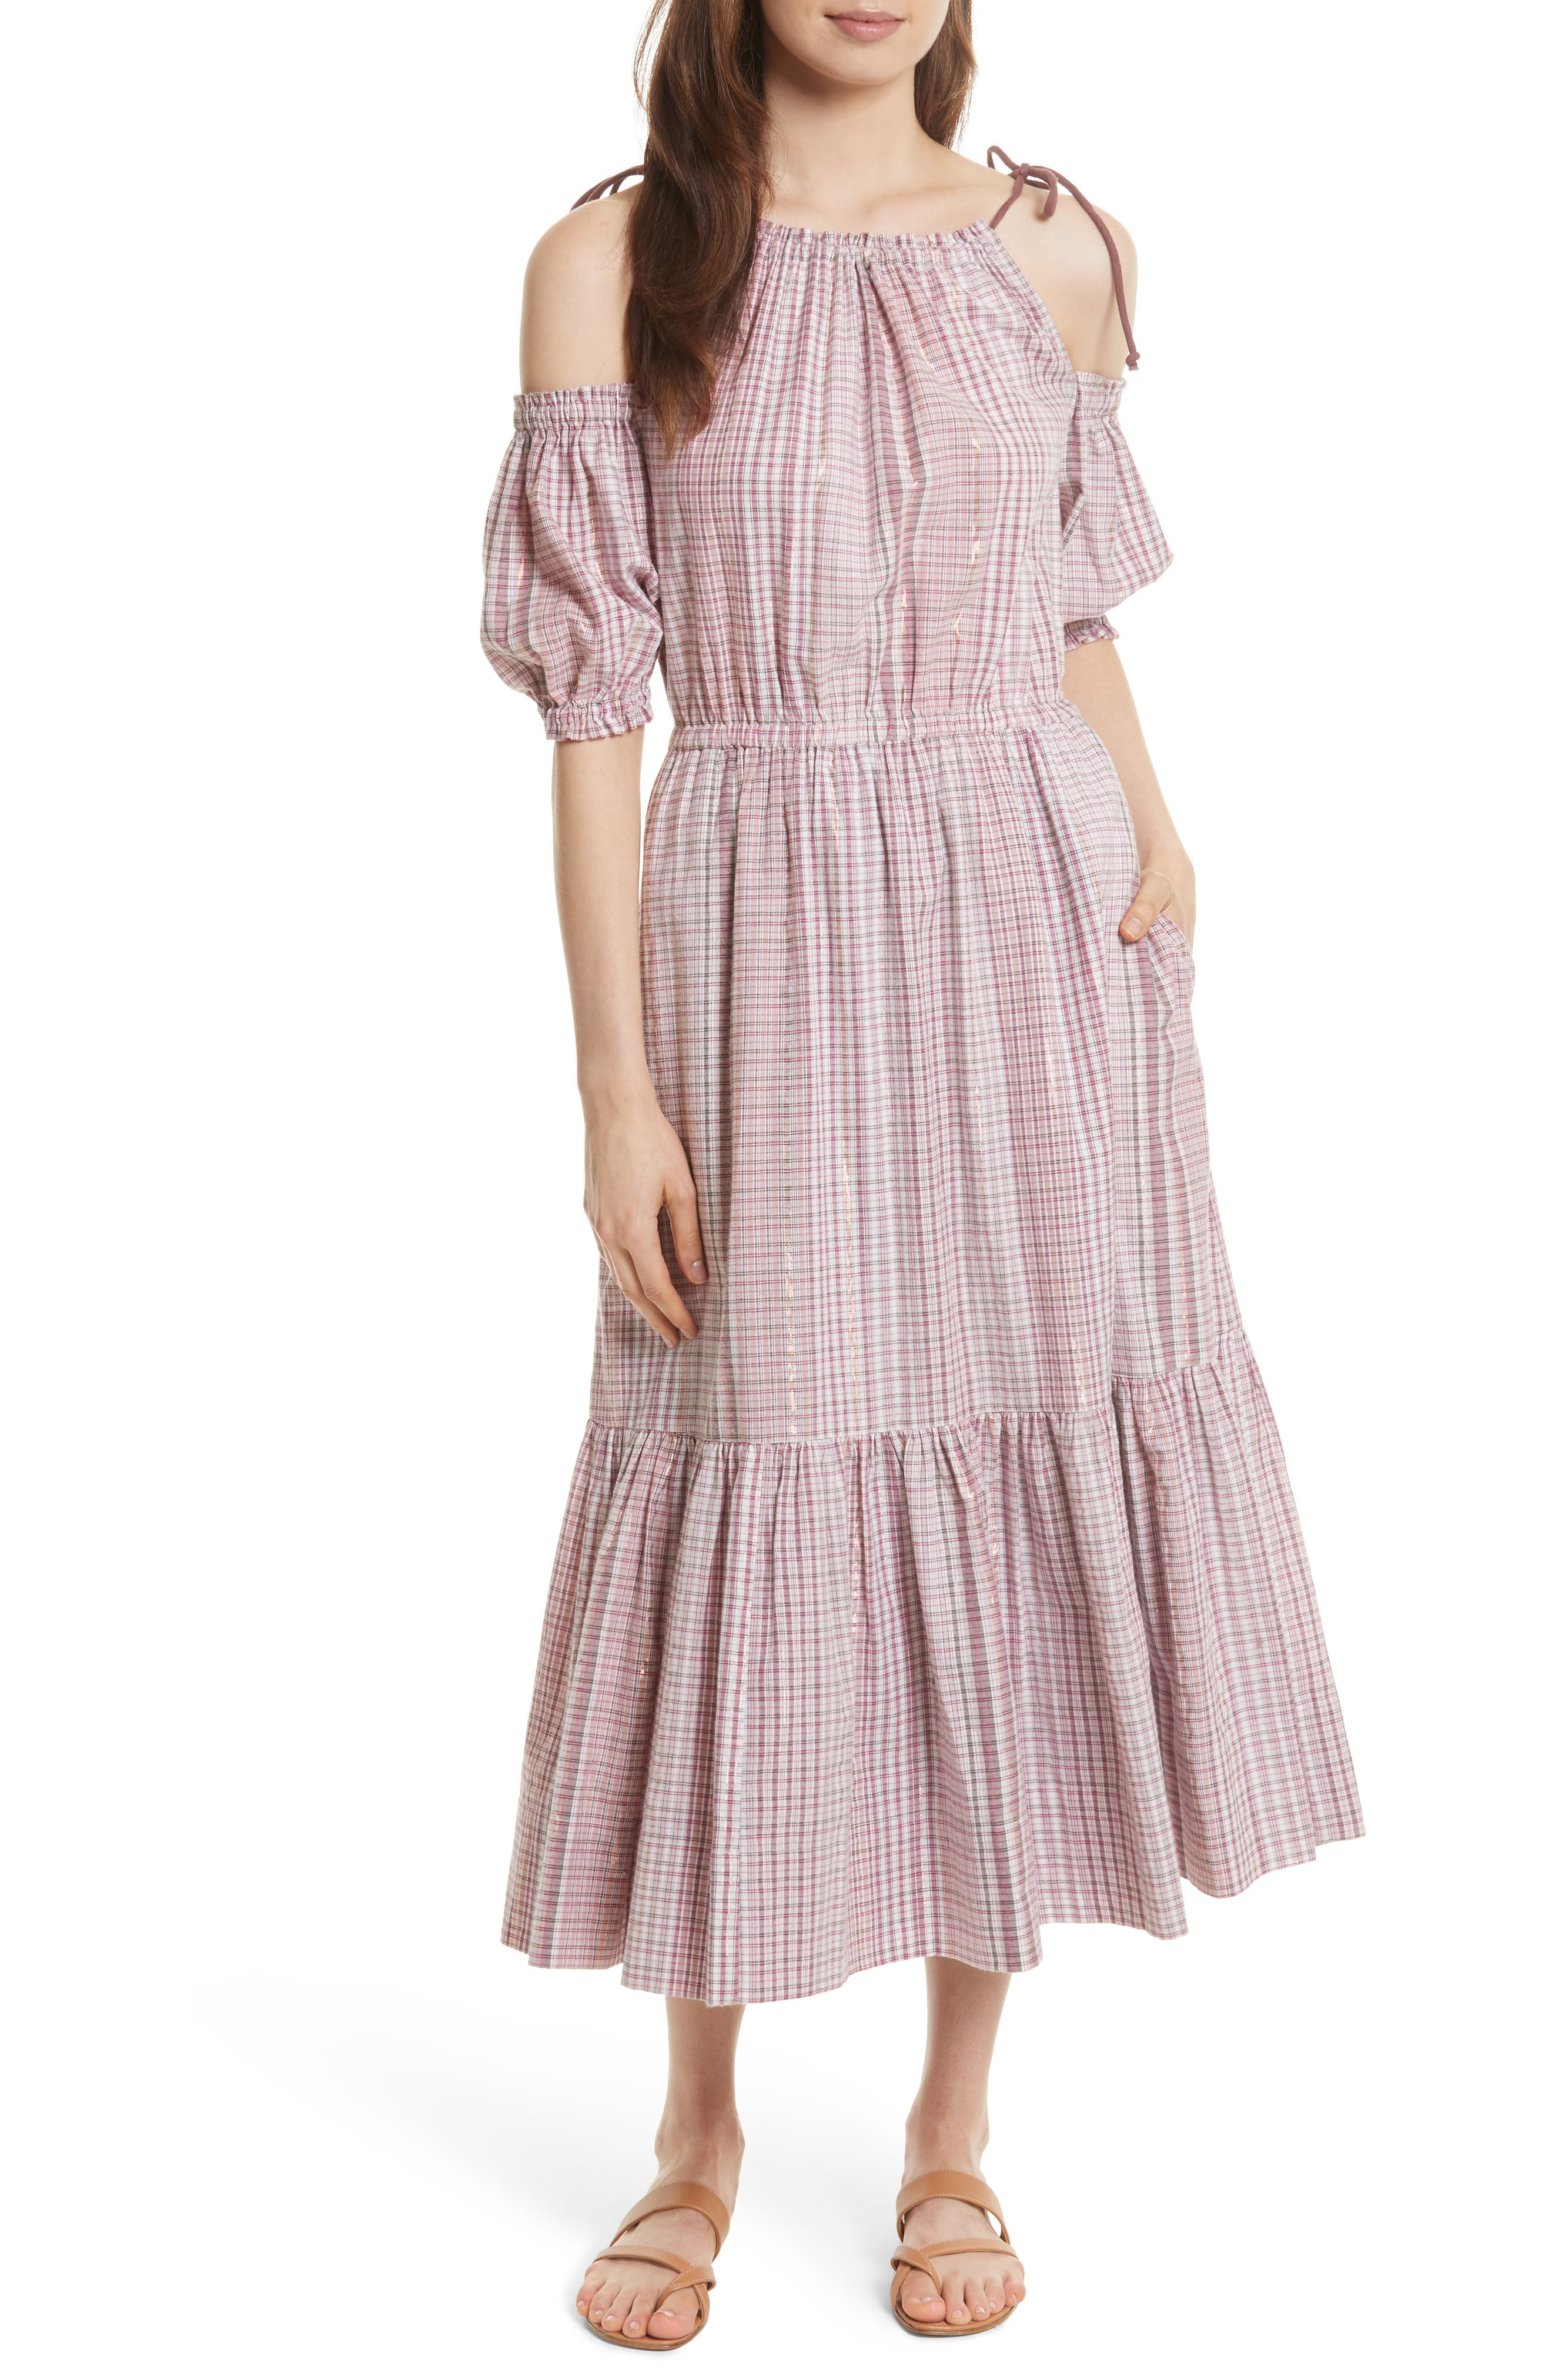 Alternate Image 1 Selected - La Vie Rebecca Taylor Cold Shoulder Lurex® Plaid Midi Dress